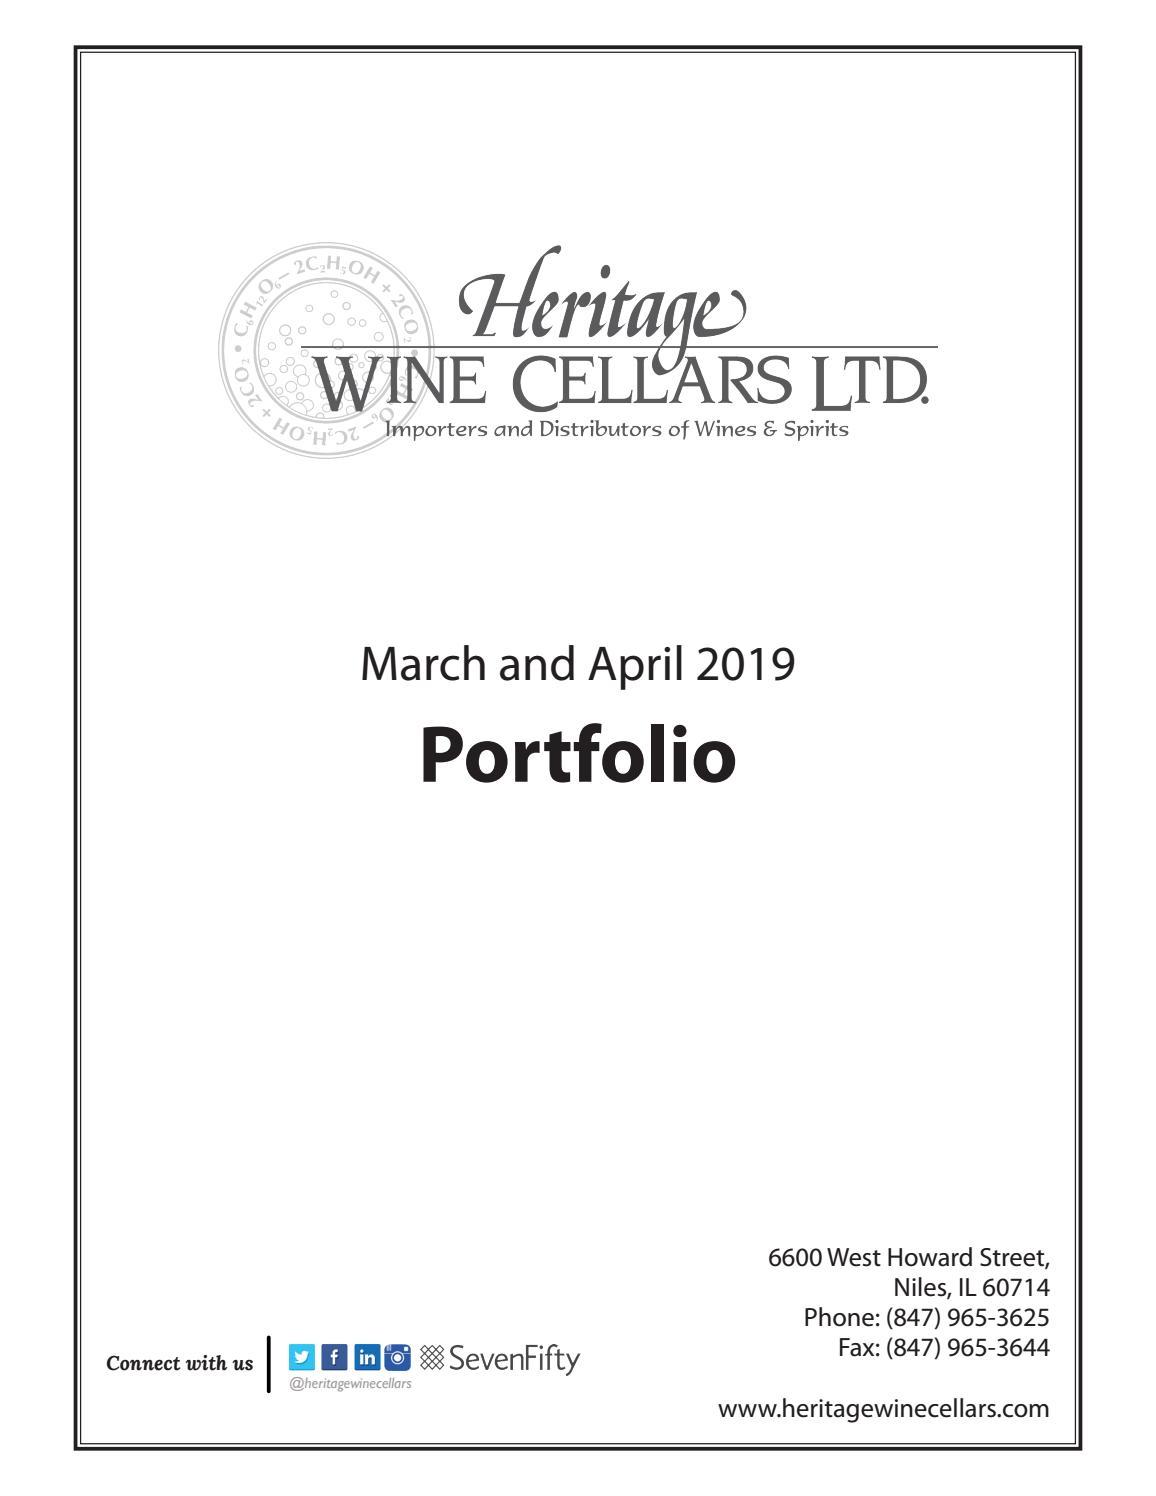 Le Jardin Des Provinces Pessac Luxe Hwc Portfolio March April by Heritage Wine Cellars issuu